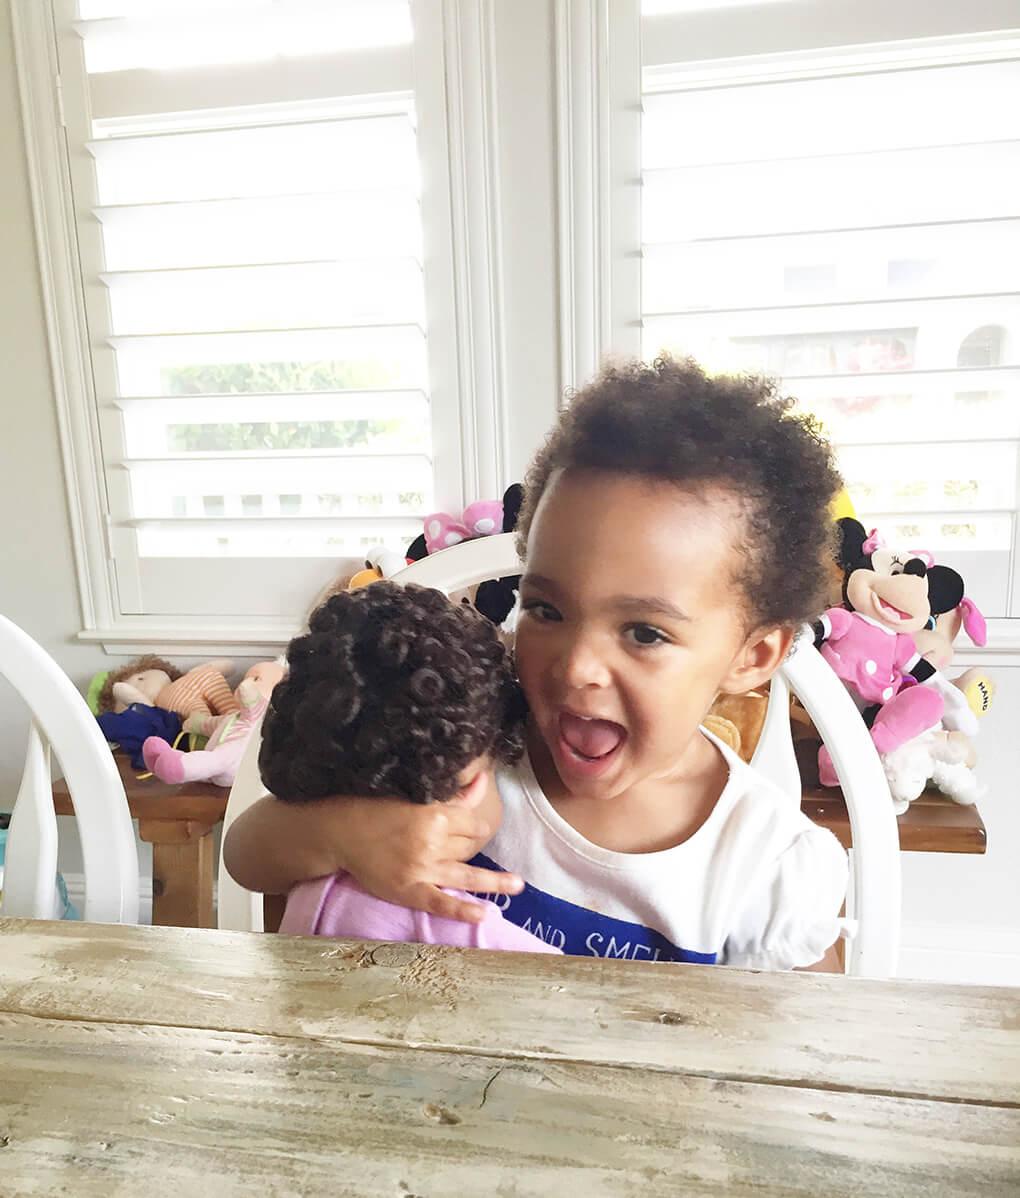 Easter is Hope TrulyMe American Girl Doll sarahkayhoffman.com Adoption